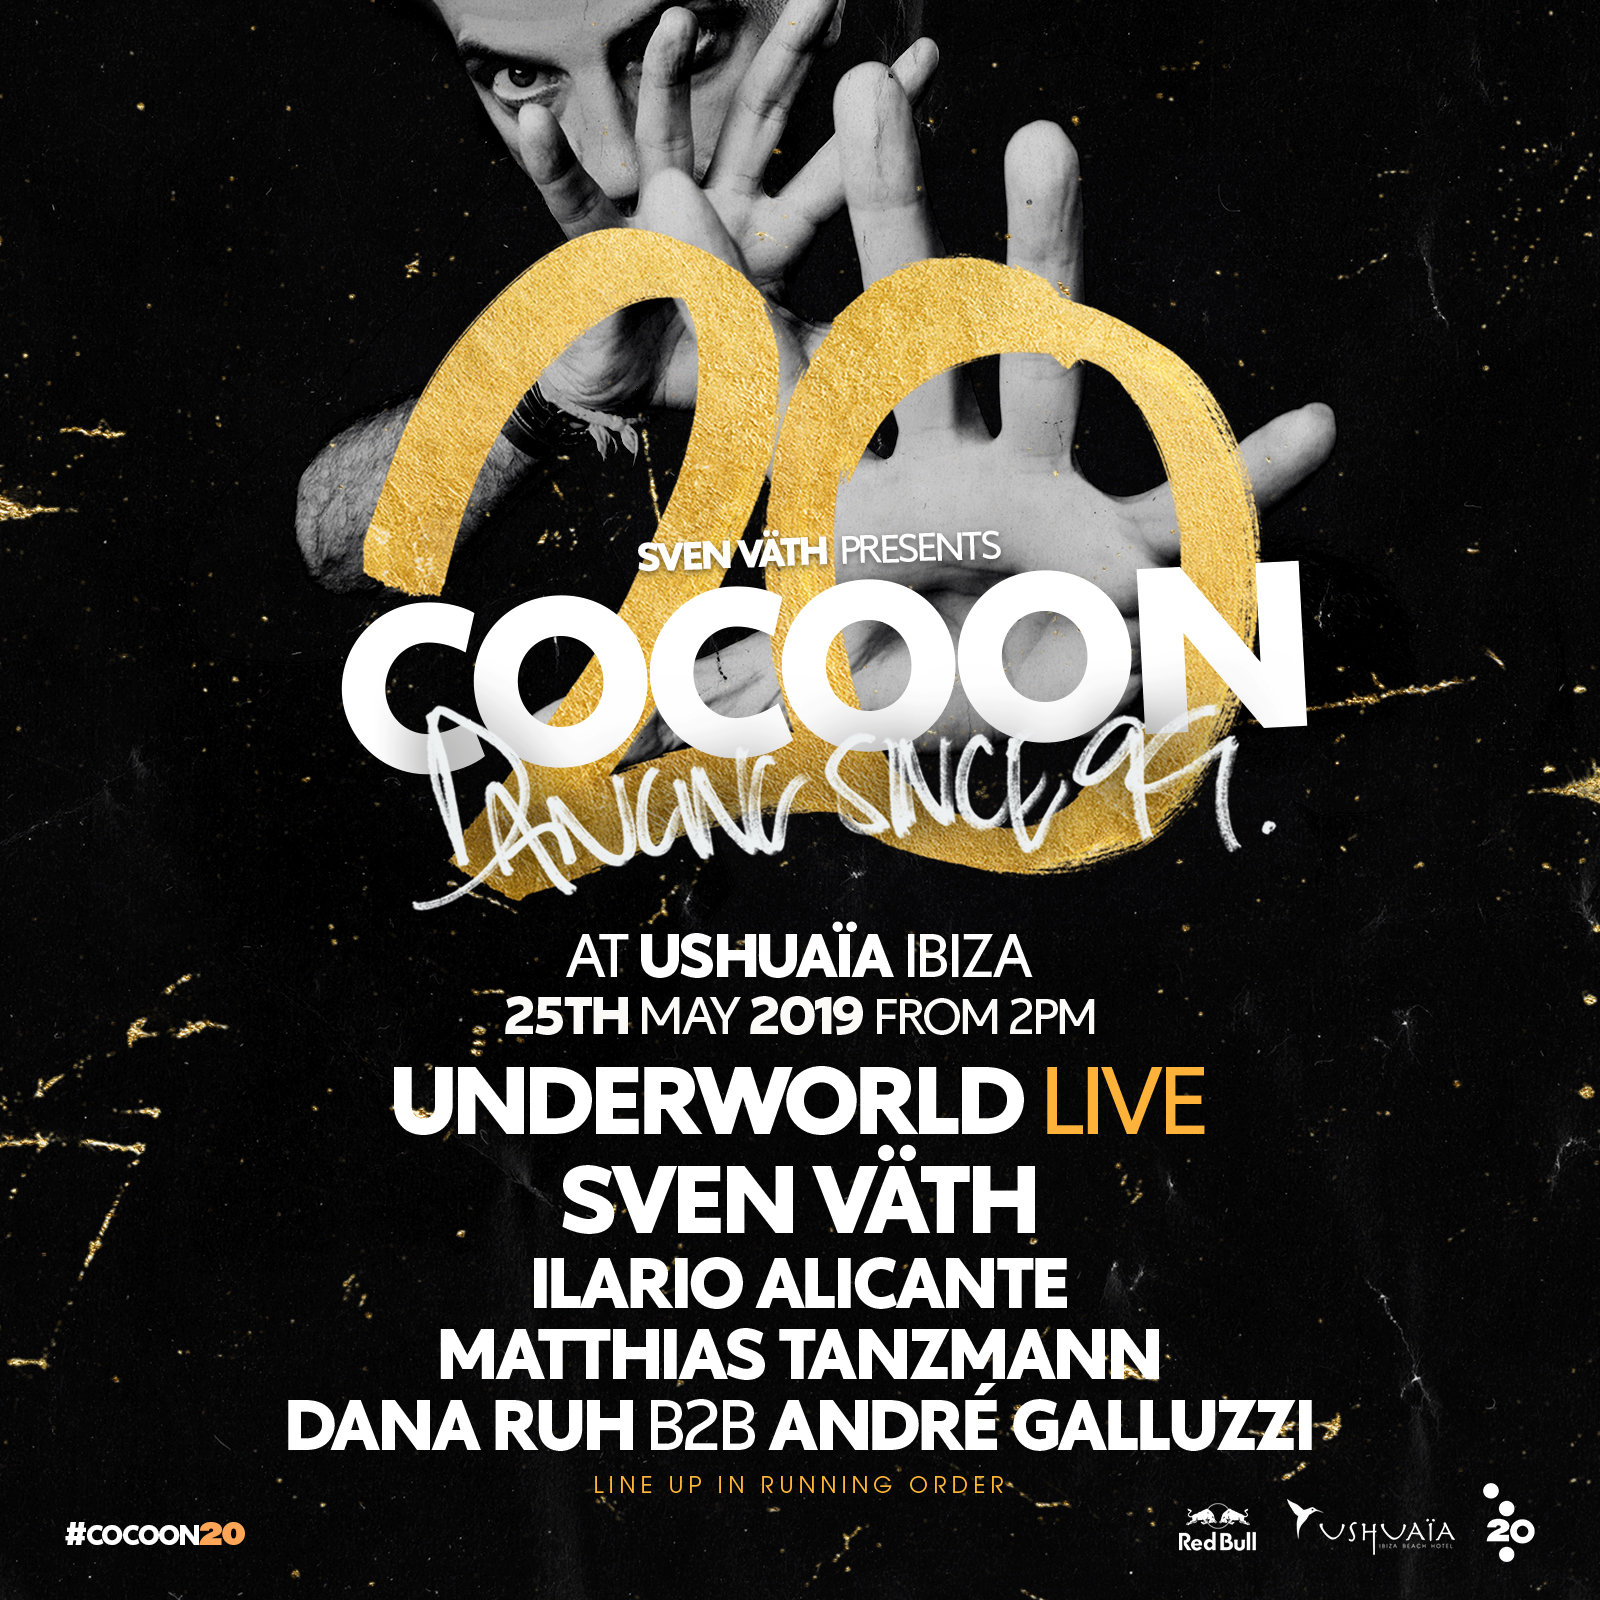 Cocoon Ibiza 20th birthday Ushuaïa line-up